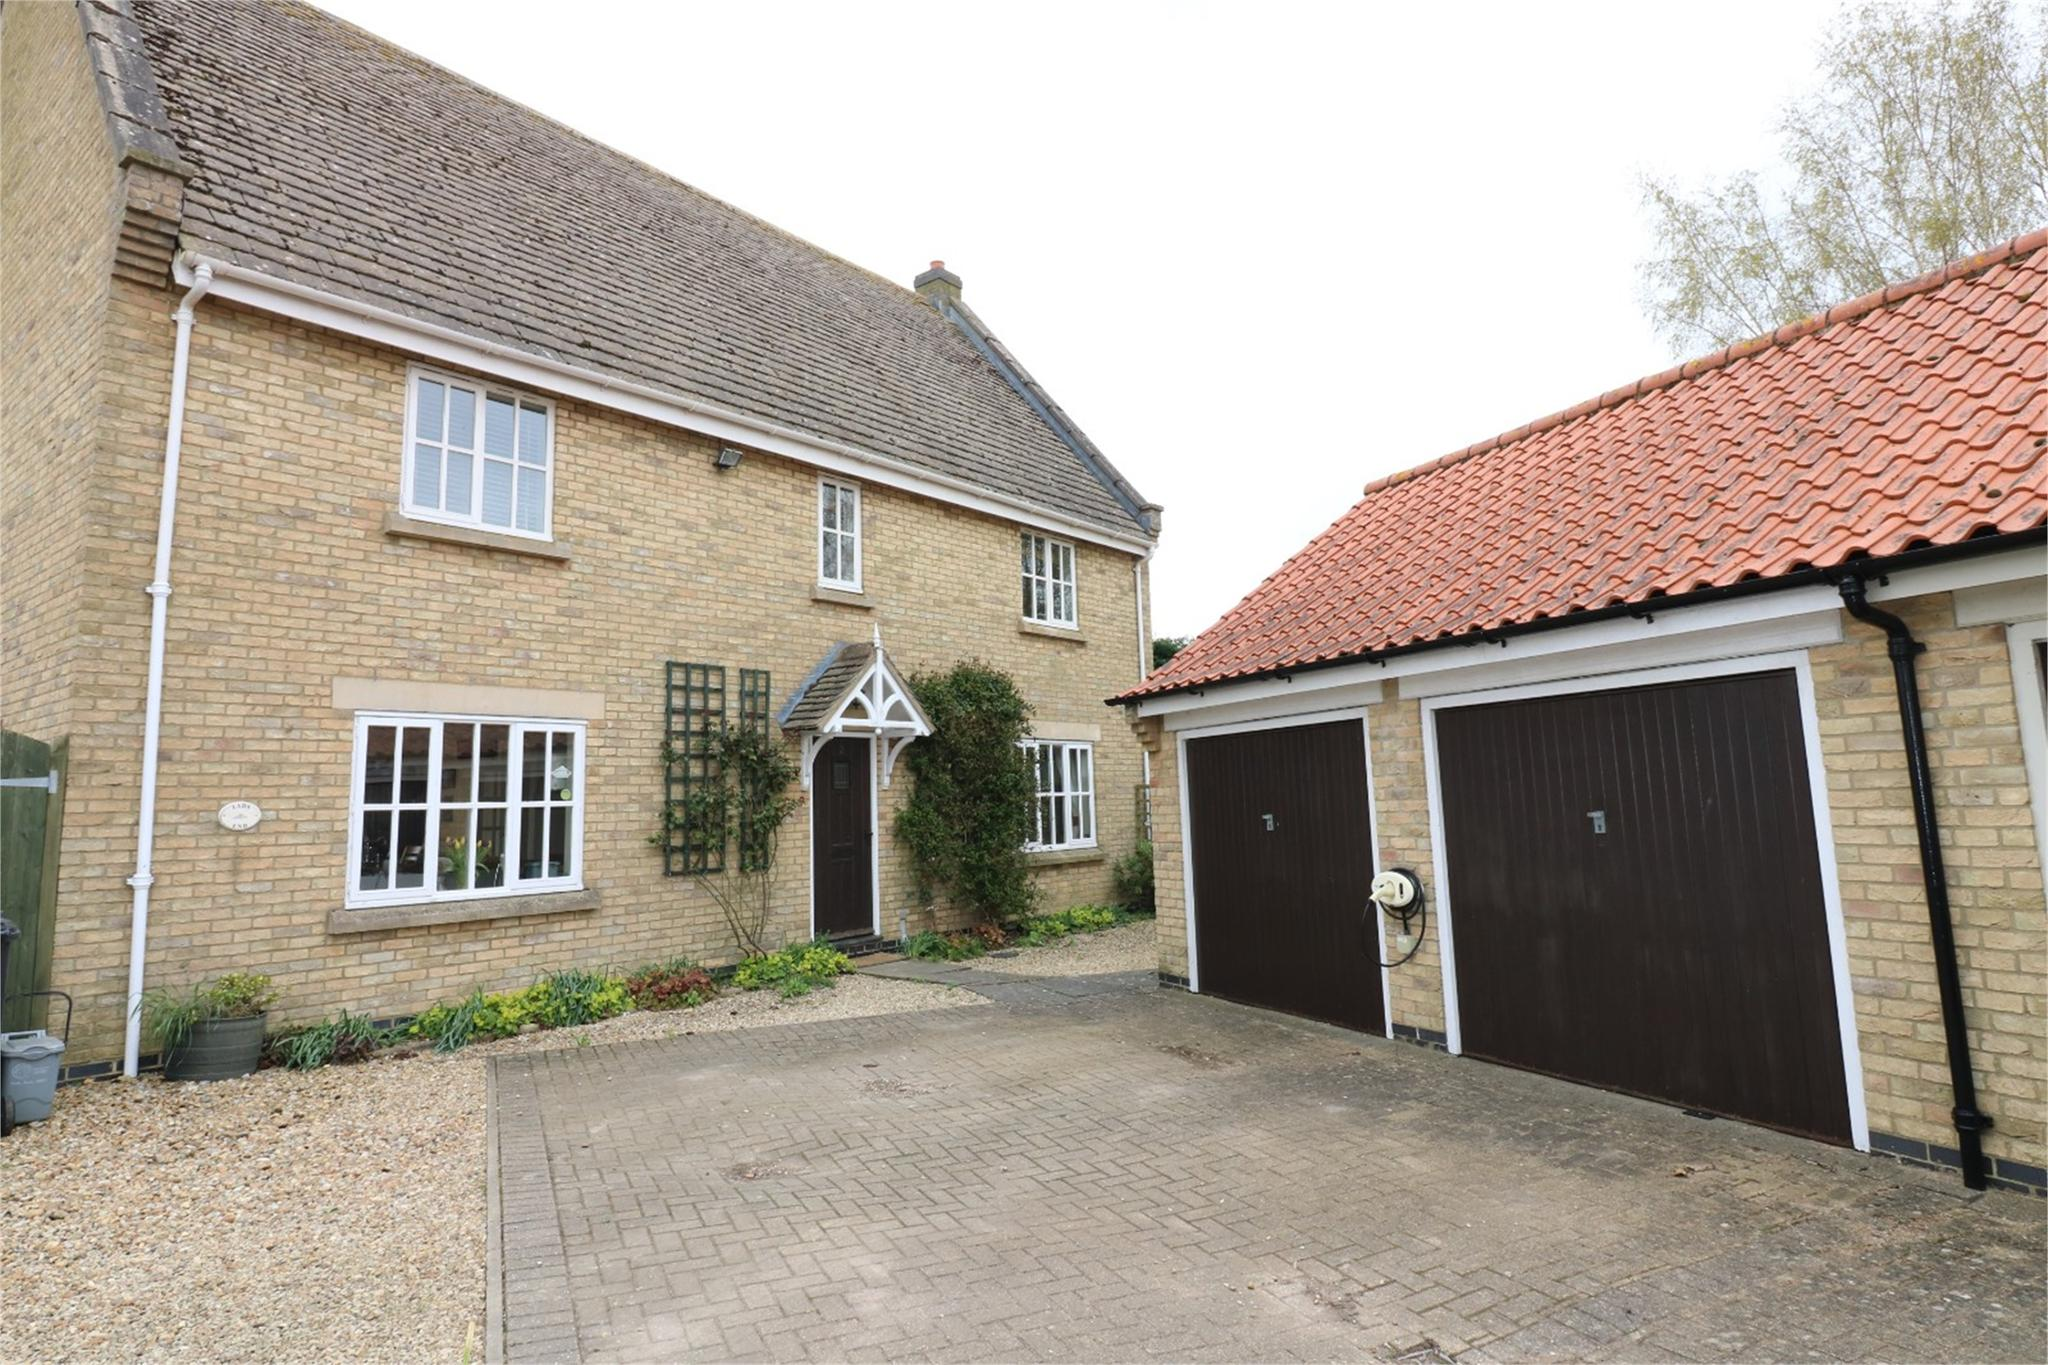 Ladds Lane, Maxey, Market Deeping, Cambridgeshire